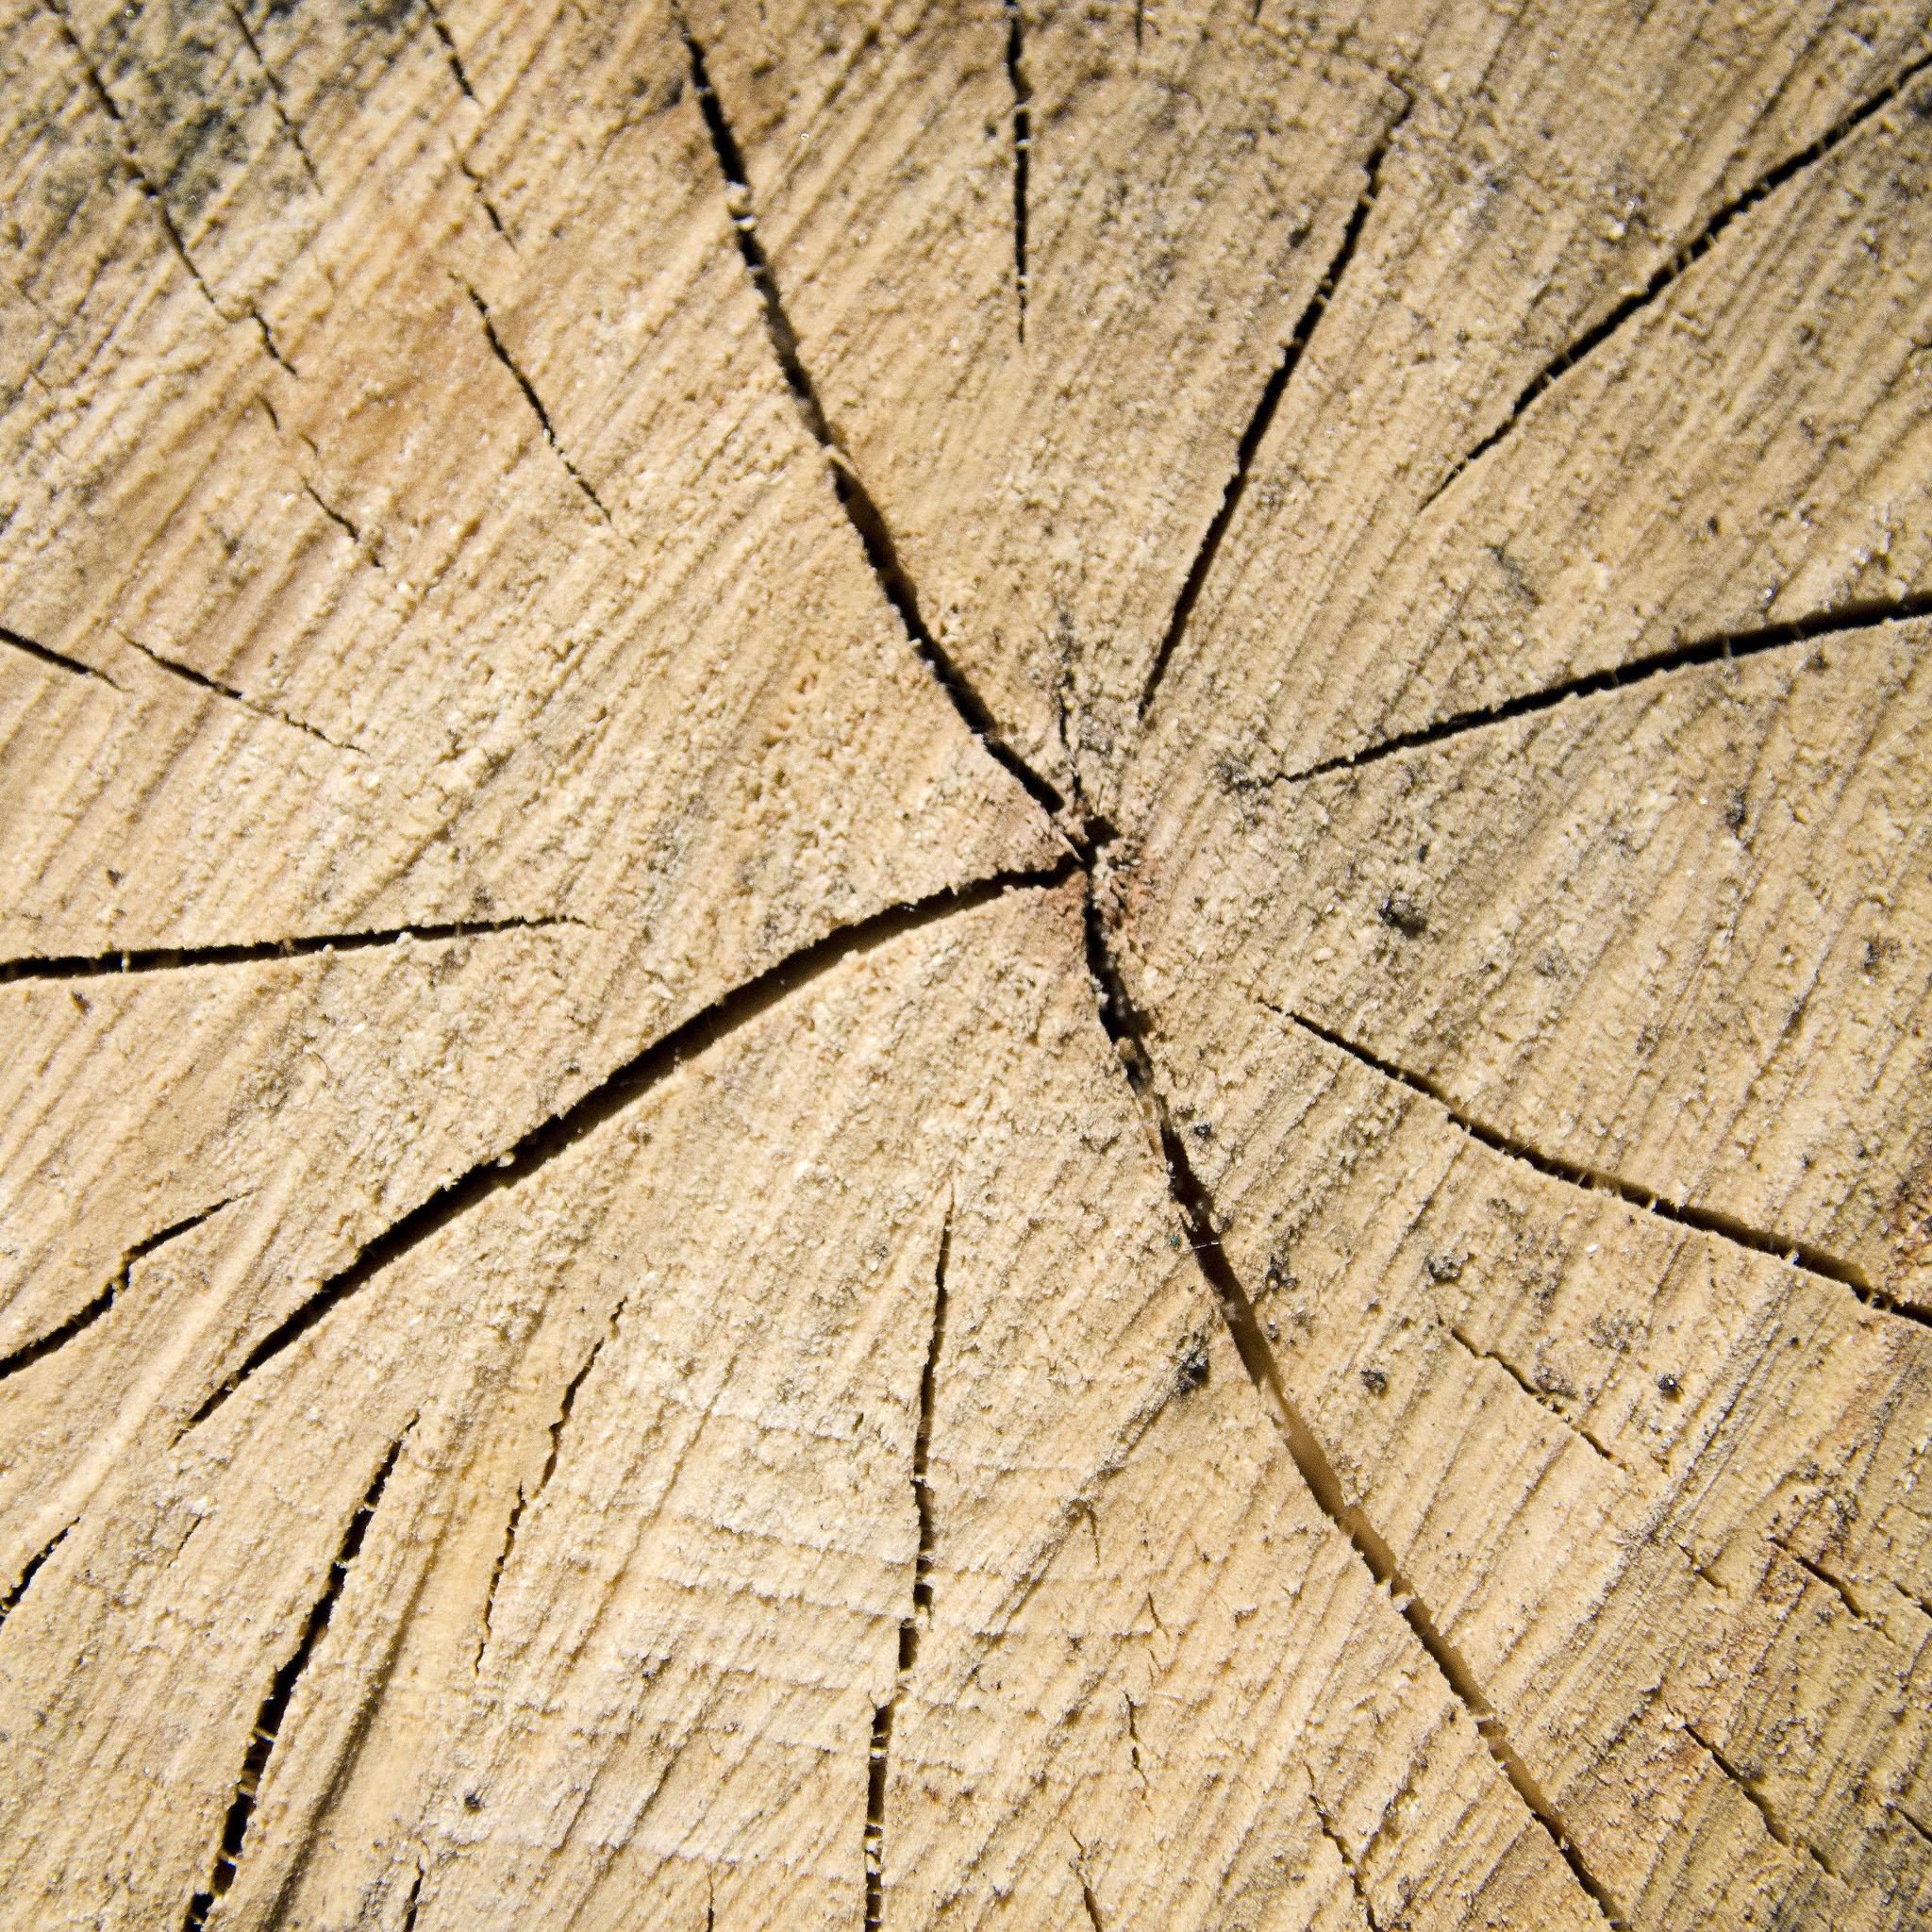 brent leimenstall - chopped wood texture ipad wallpaper